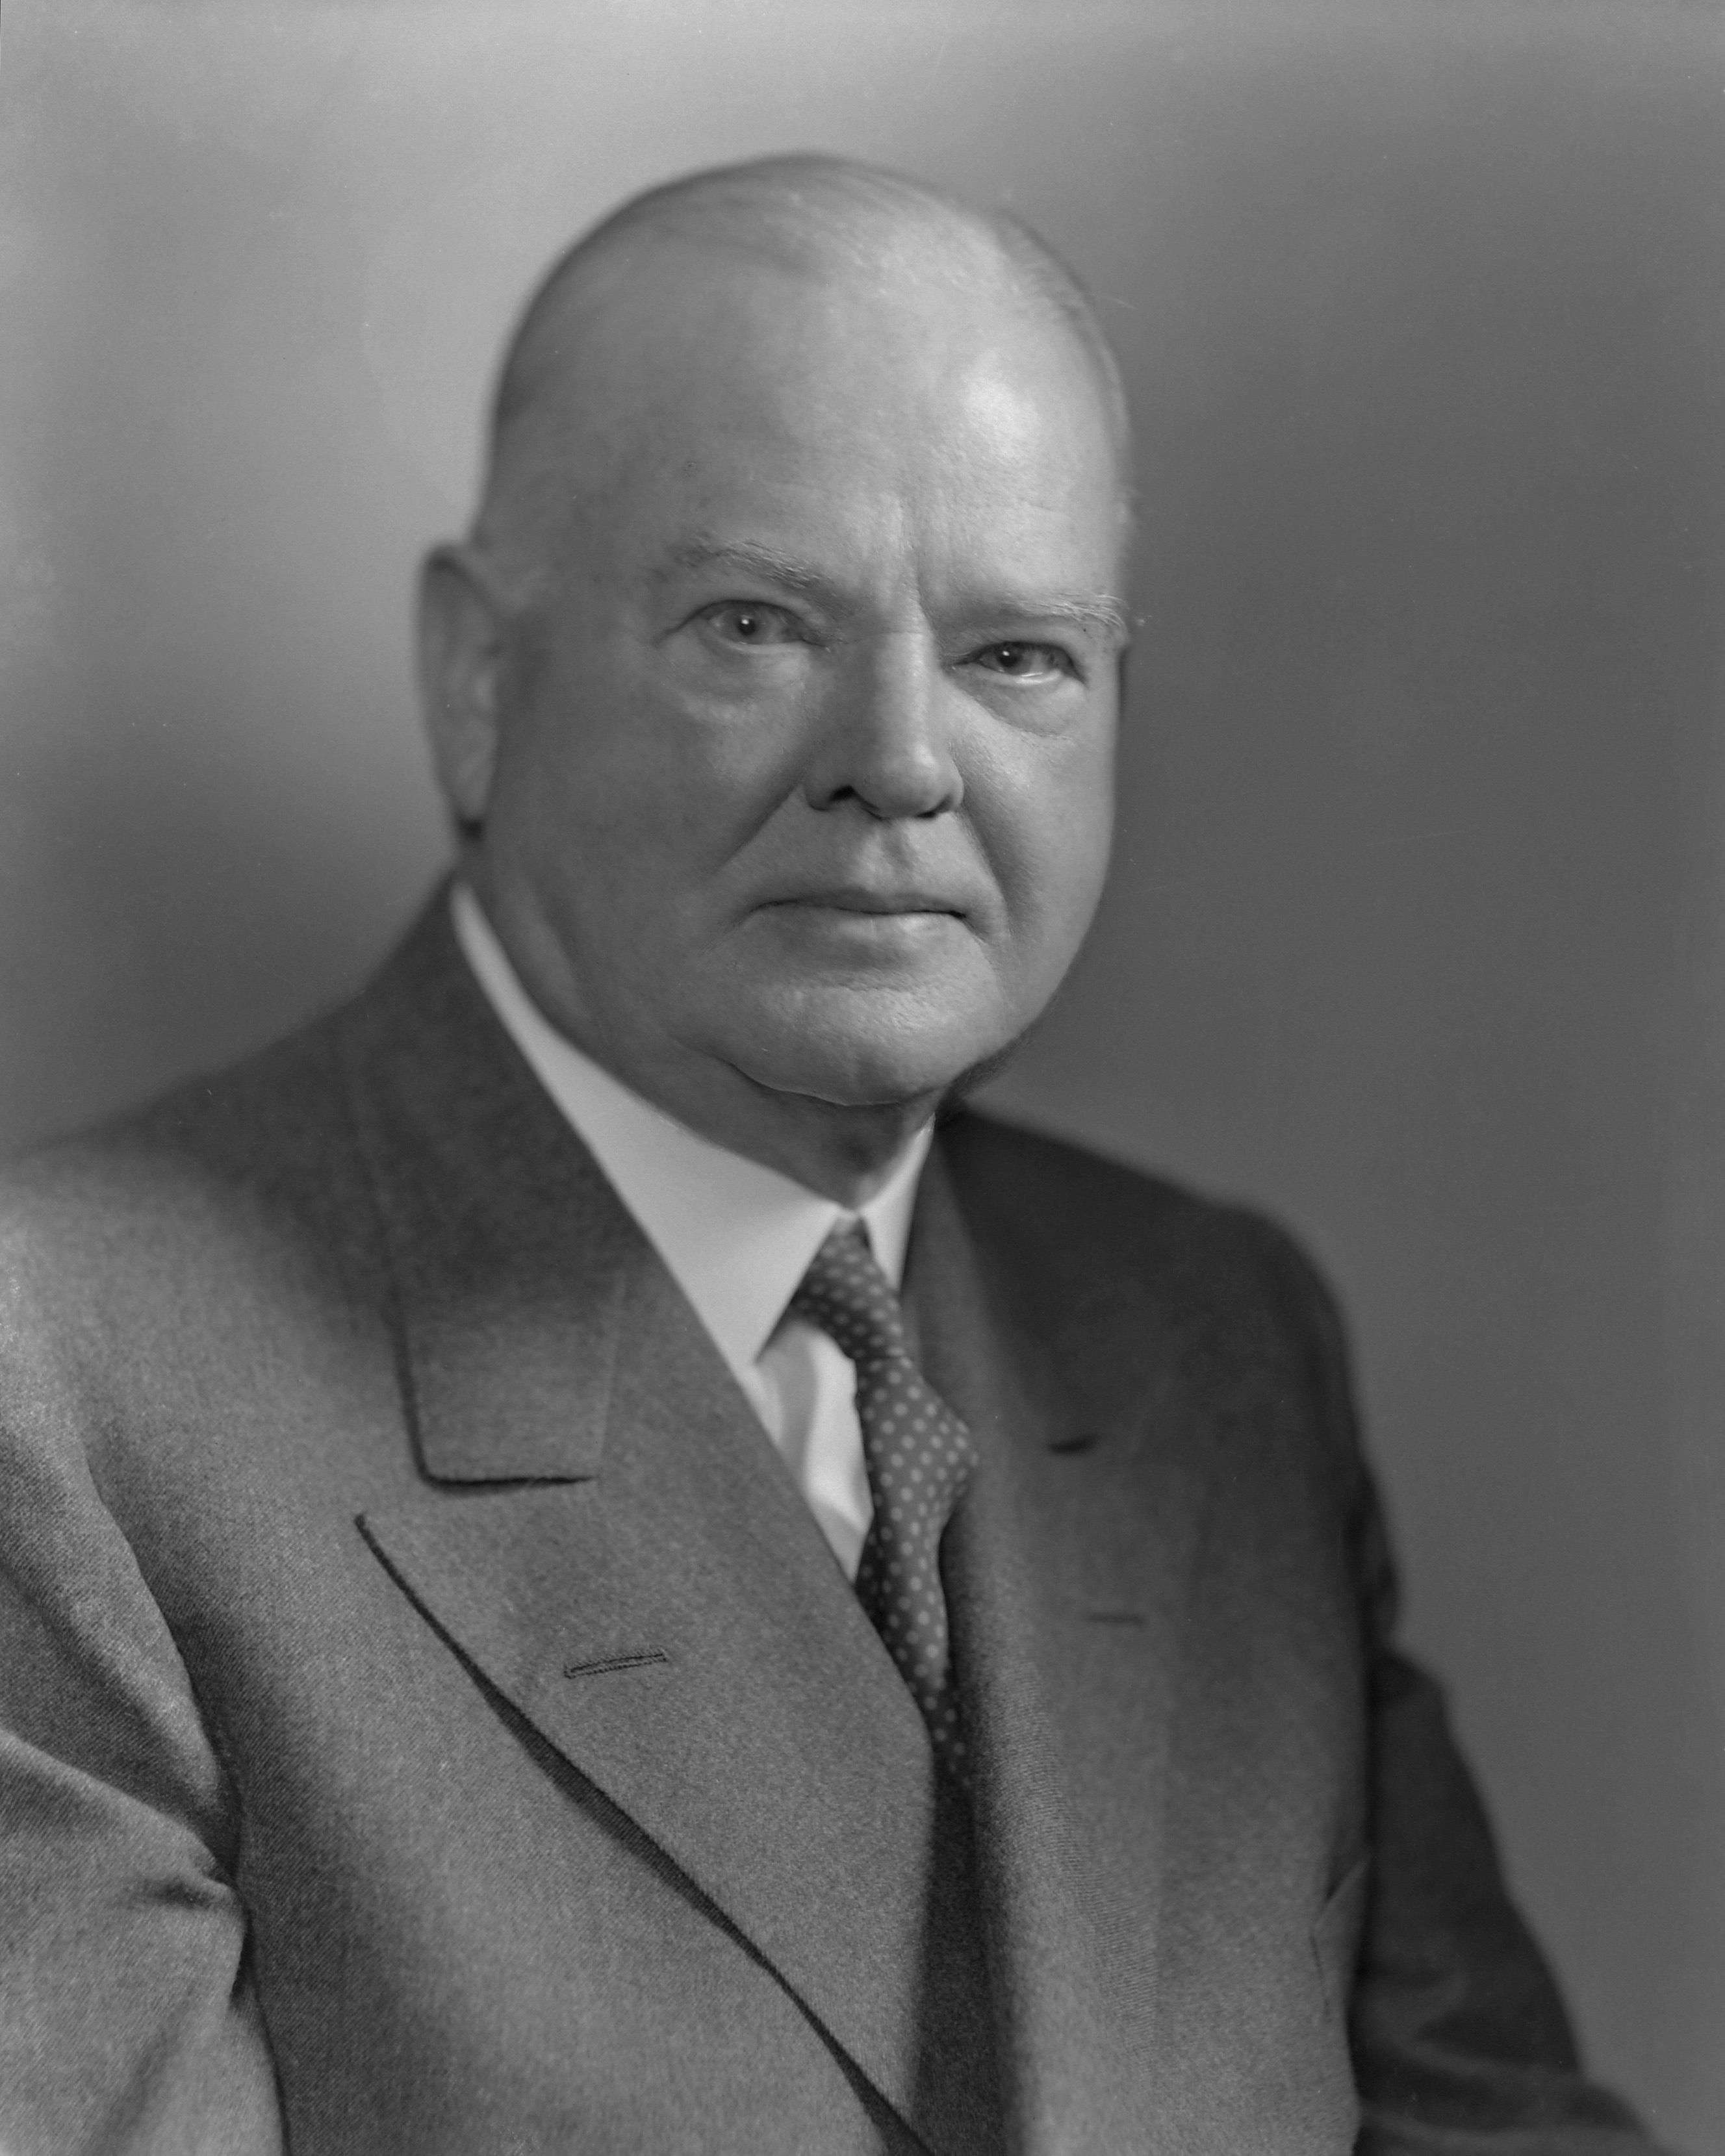 O Χέρμπερτ Χούβερ (Herbert Clark Hoover, 10 Αυγούστου 1874 - 20 Οκτωβρίου 1964) ήταν ο 31ος πρόεδρος των ΗΠΑ (1929-1933).